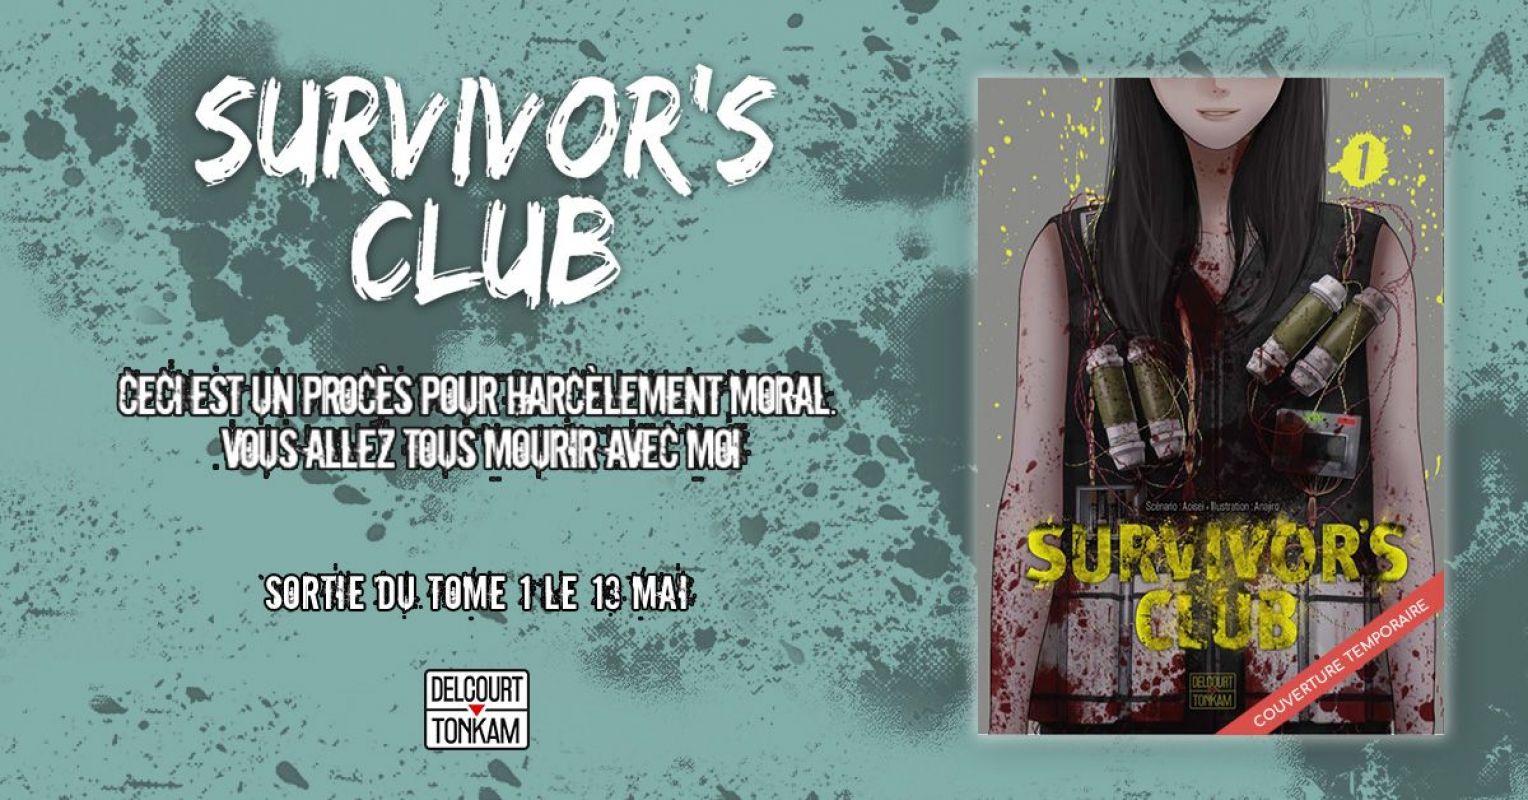 Survivor's Club chez Delcourt/Tonkam